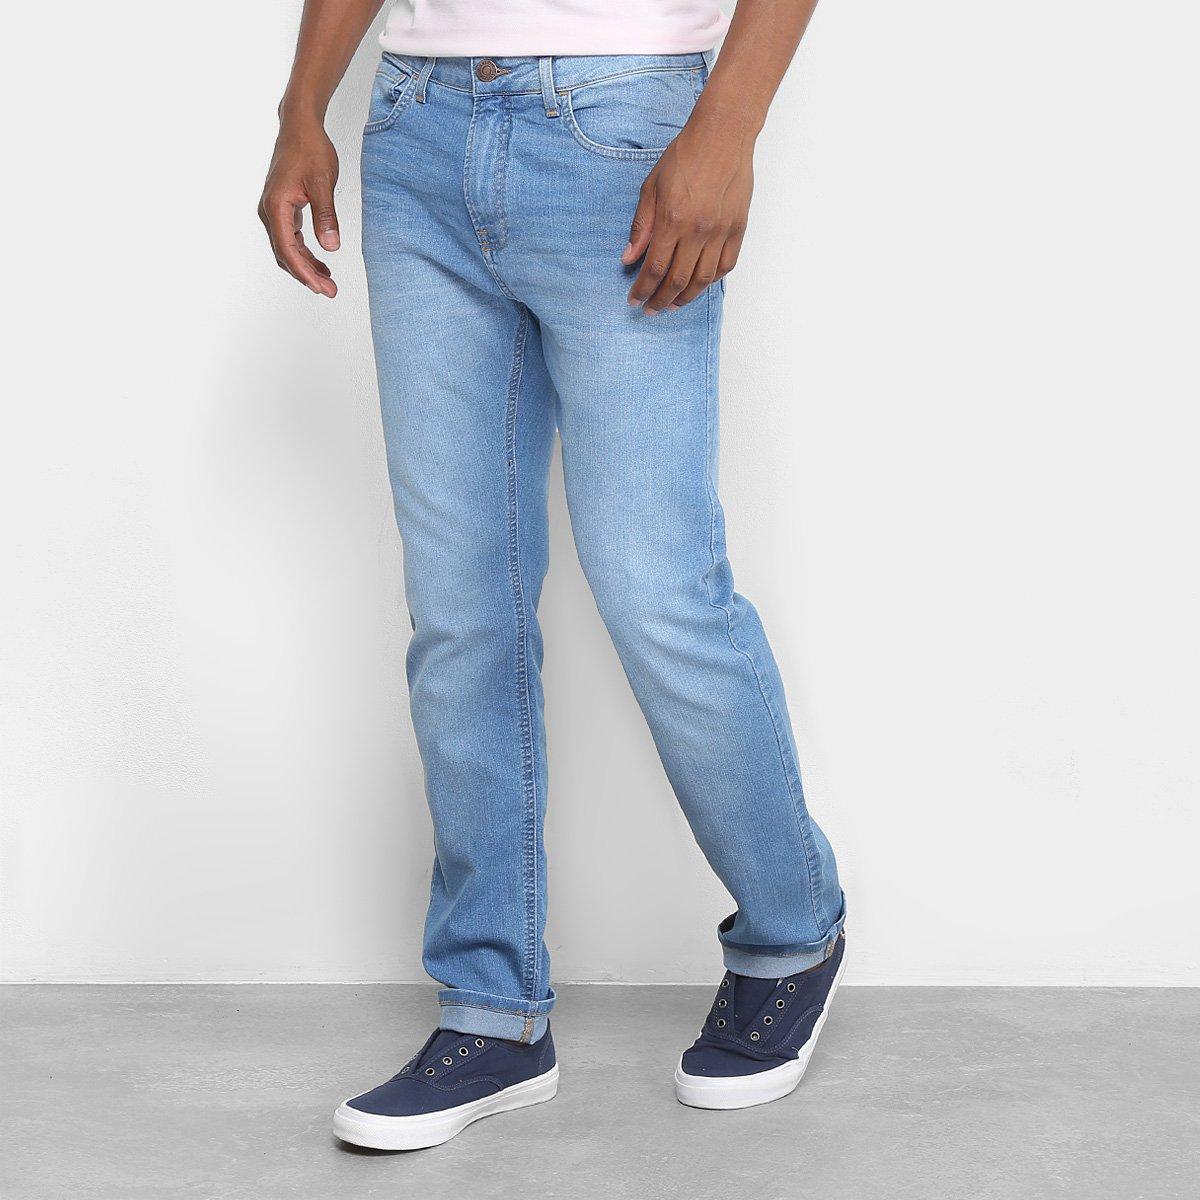 0dd86dc11016d Calça Jeans Slim Calvin Klein Estonada Masculina - Azul Claro - Compre Agora